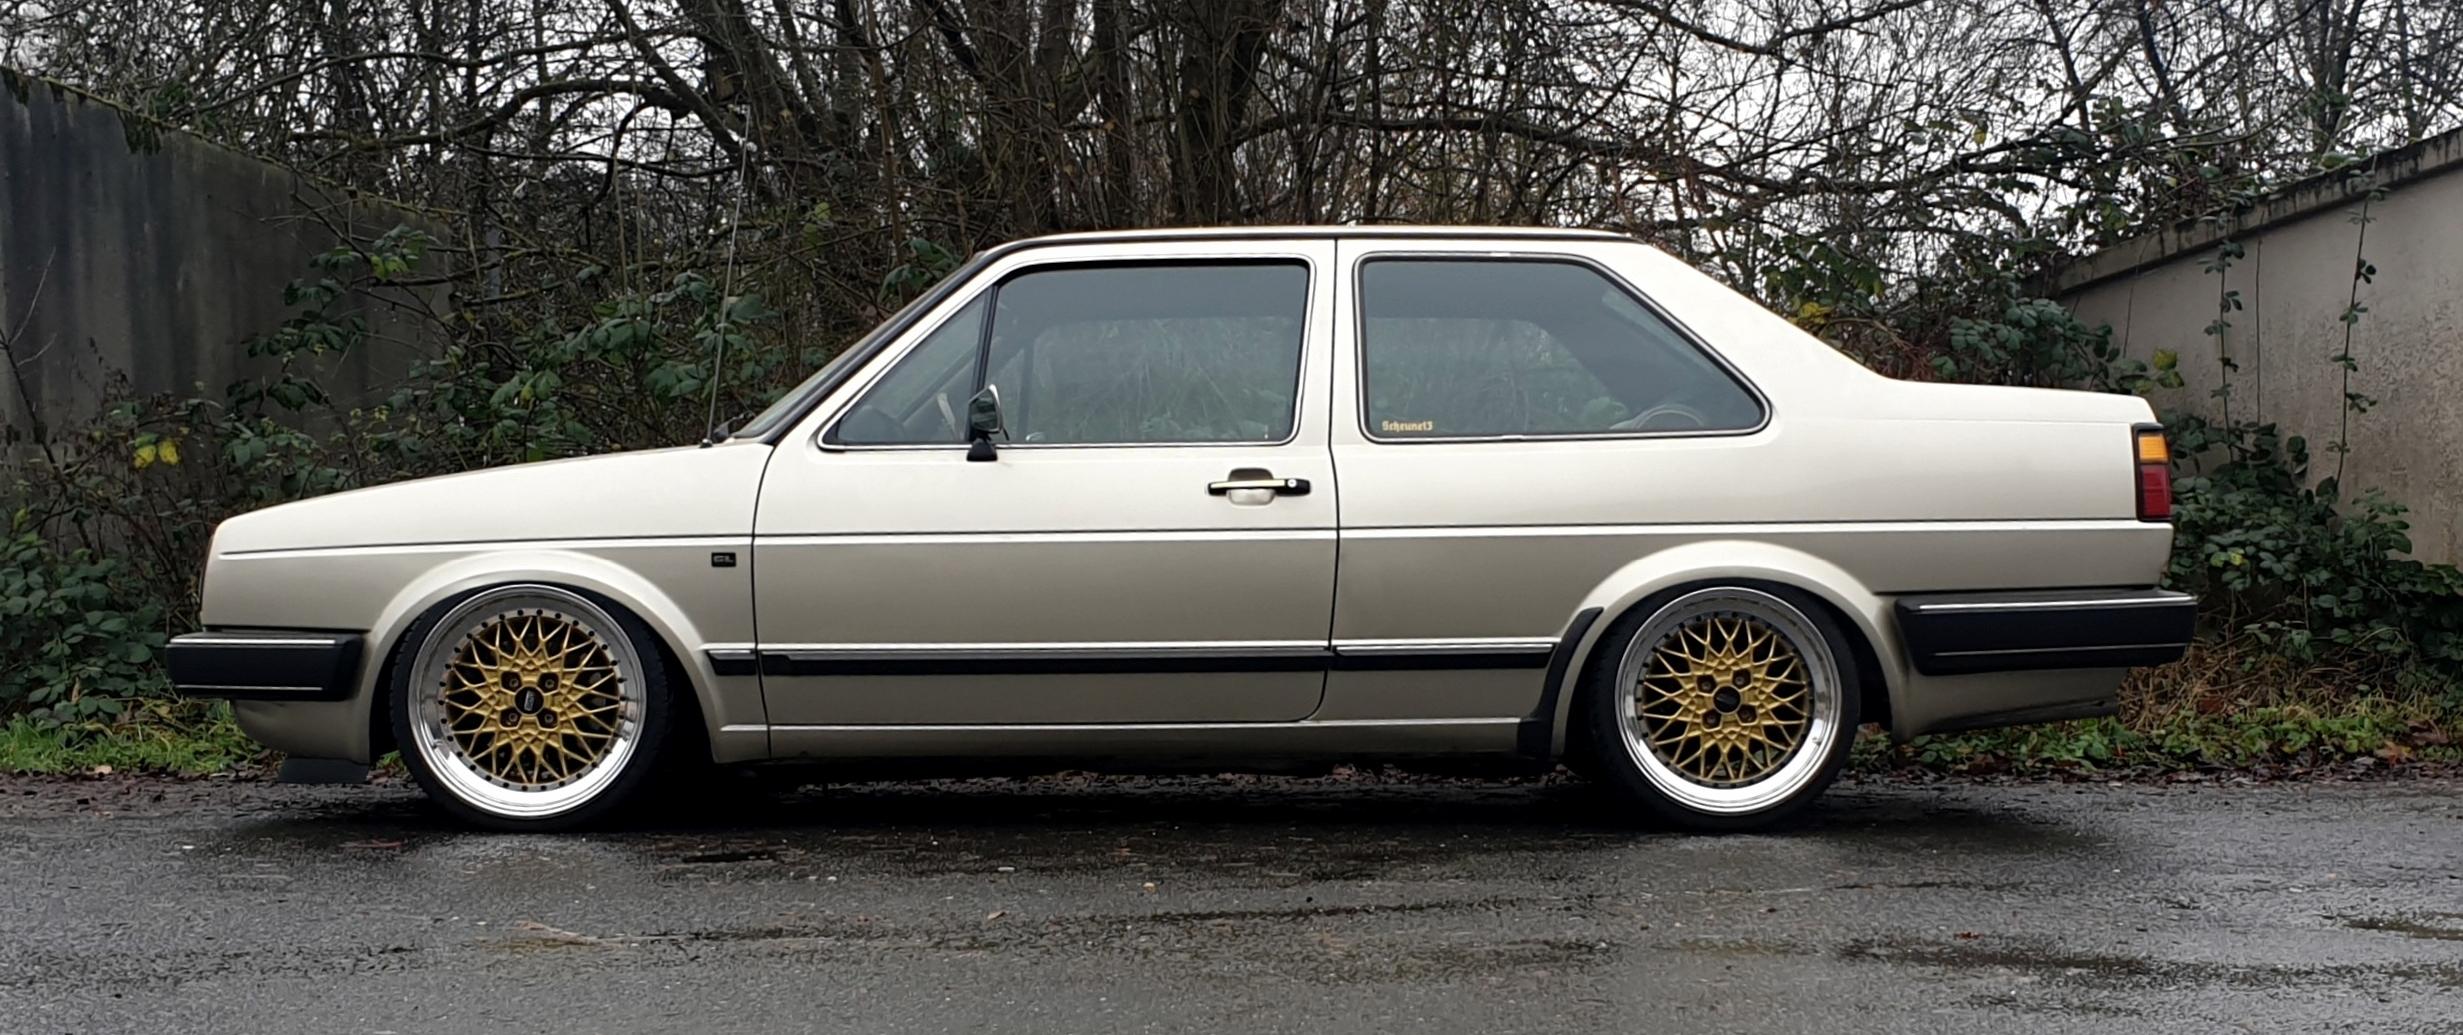 VW – Jetta – Gold – 5050RIMS – Custom RA 375 – Gold – 17 Zoll